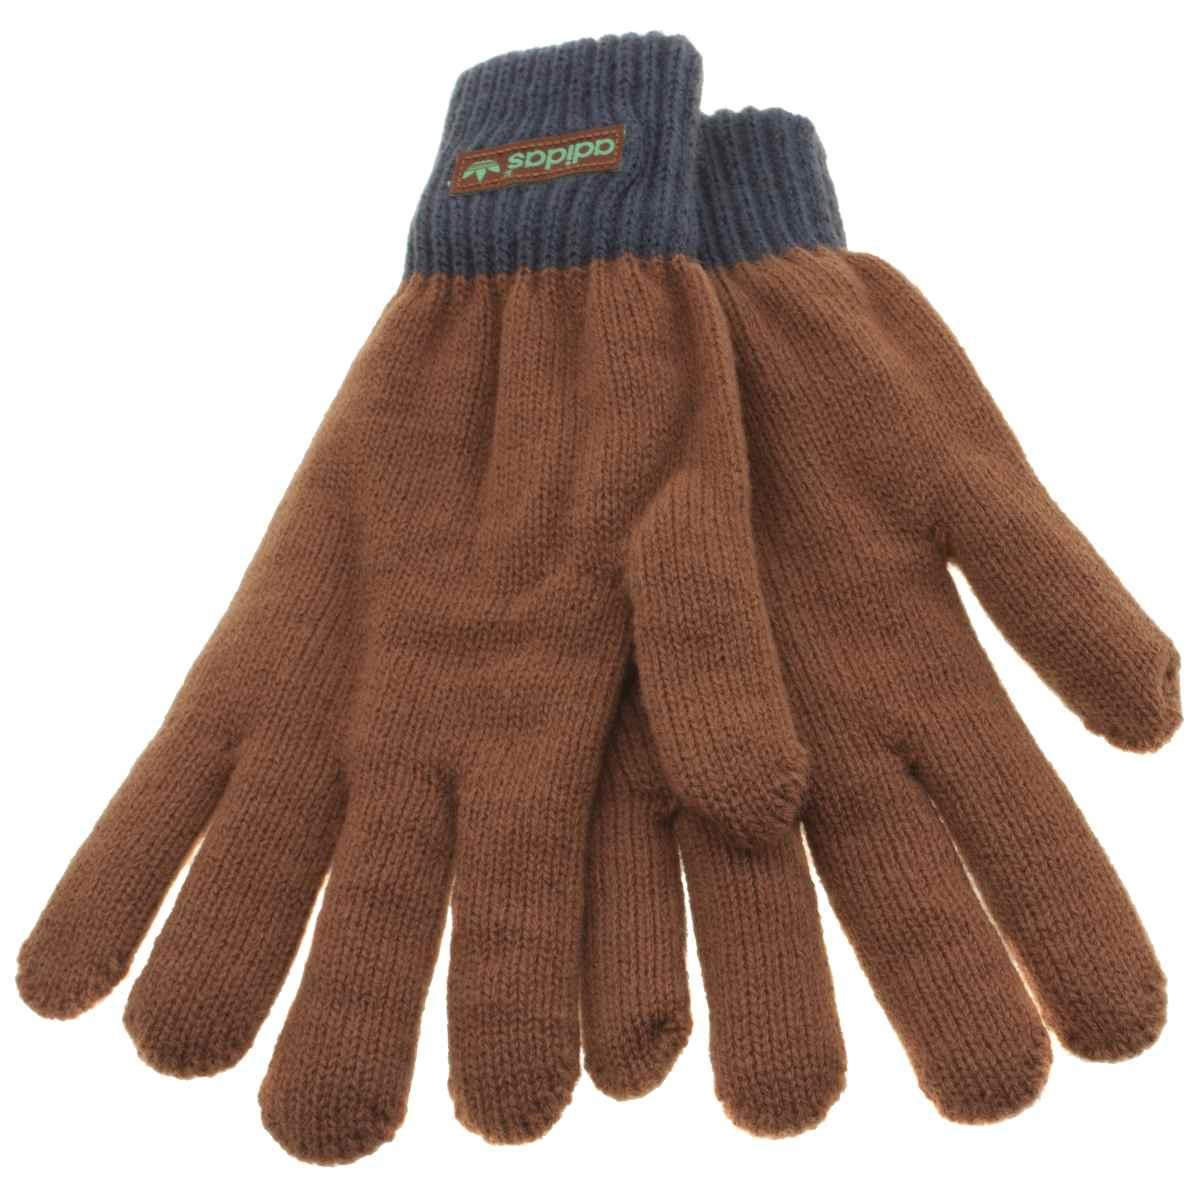 Adidas Brown & Navy Padded Glove